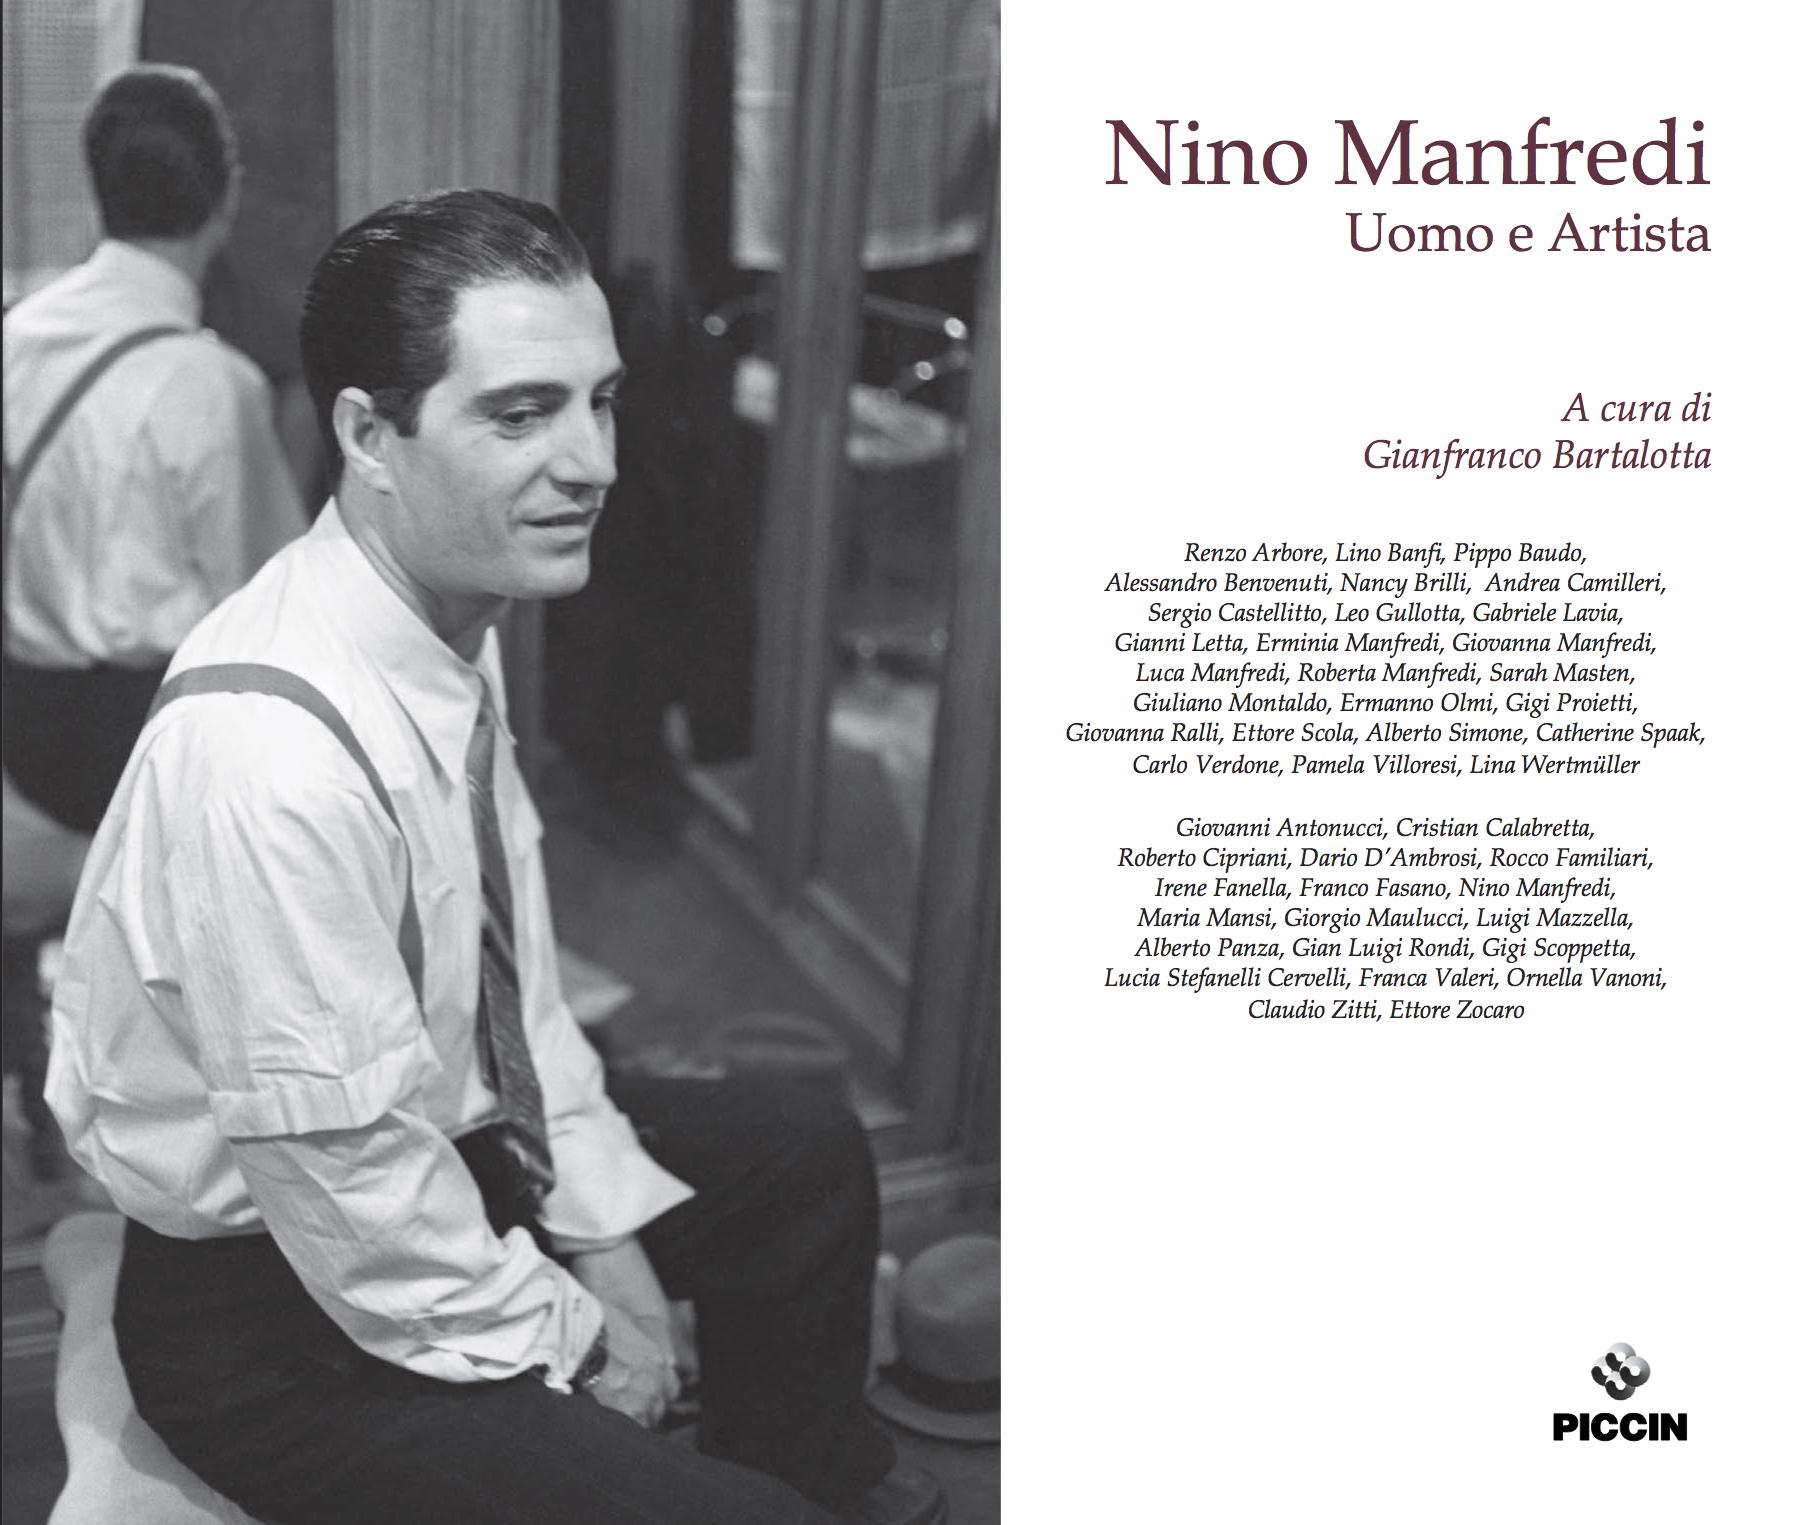 Nino Manfredi. Uomo e Artista